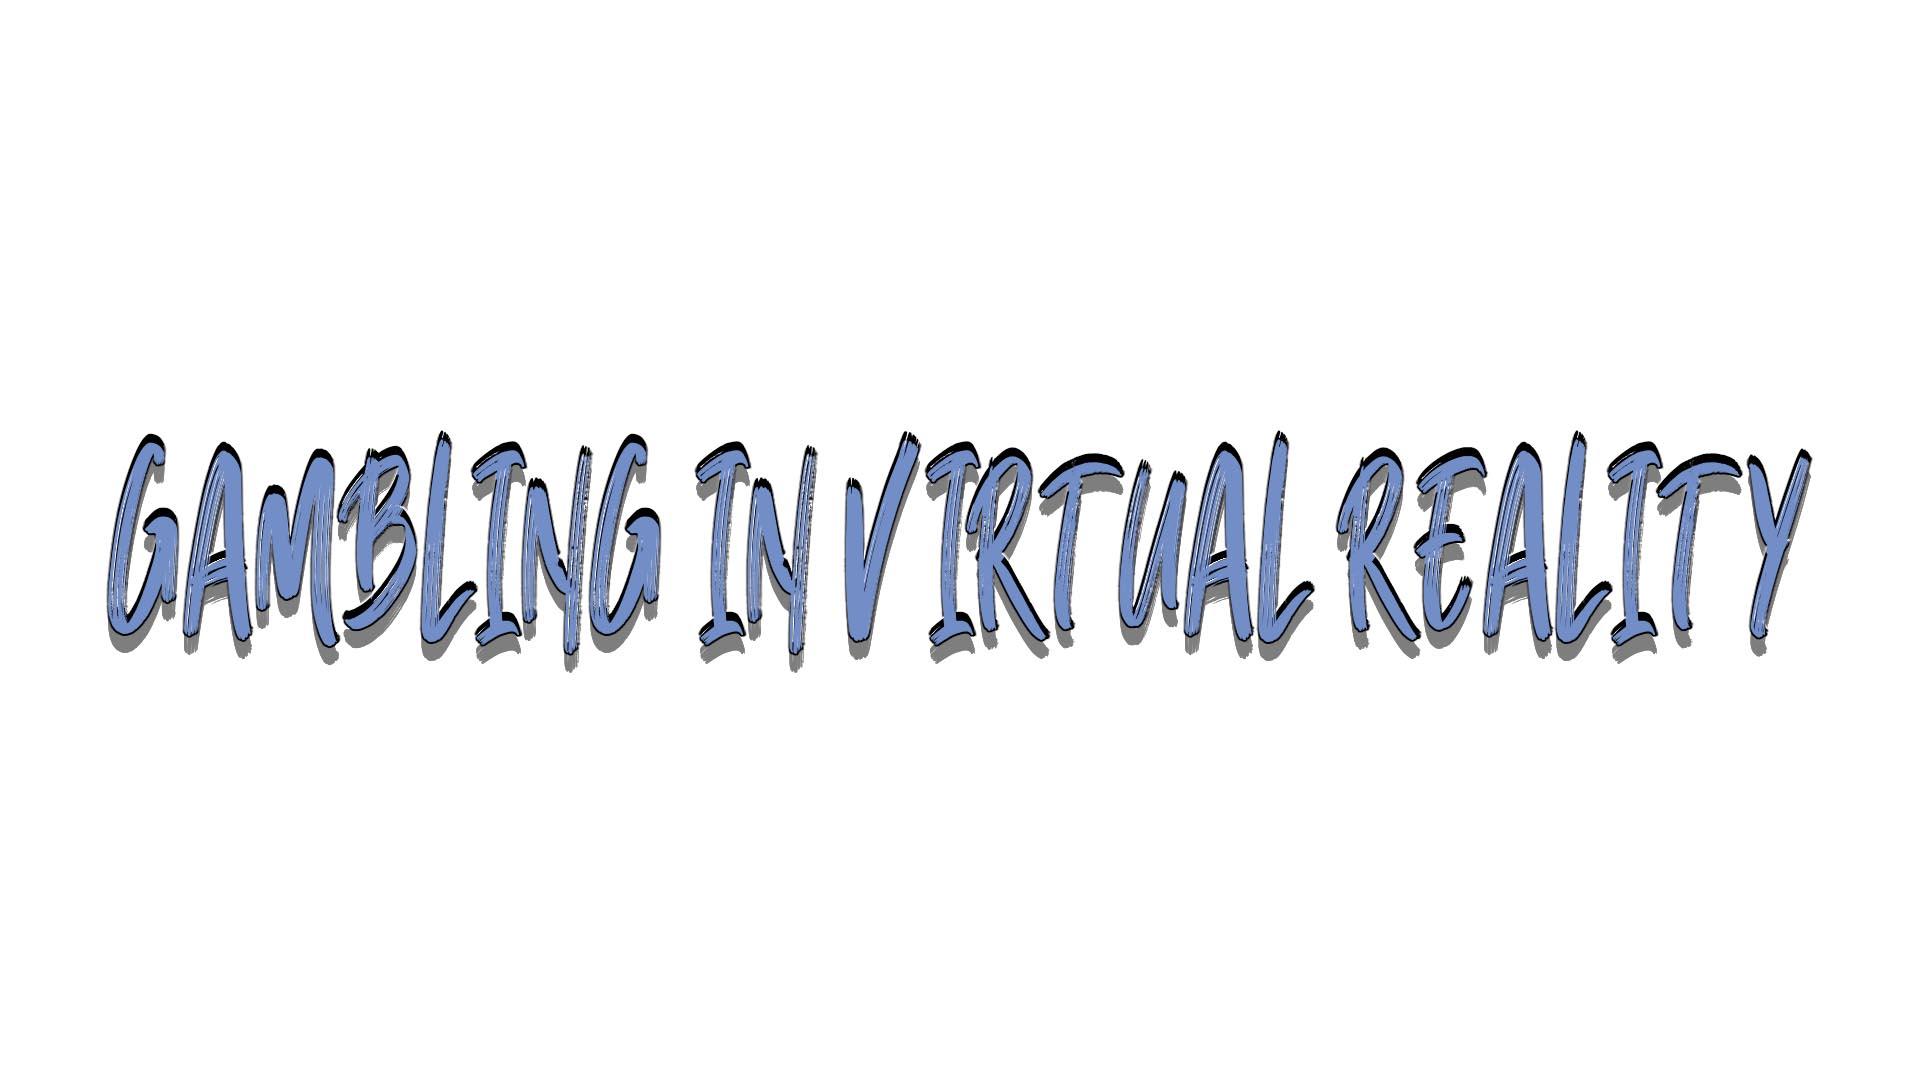 Gambling in virtual reality